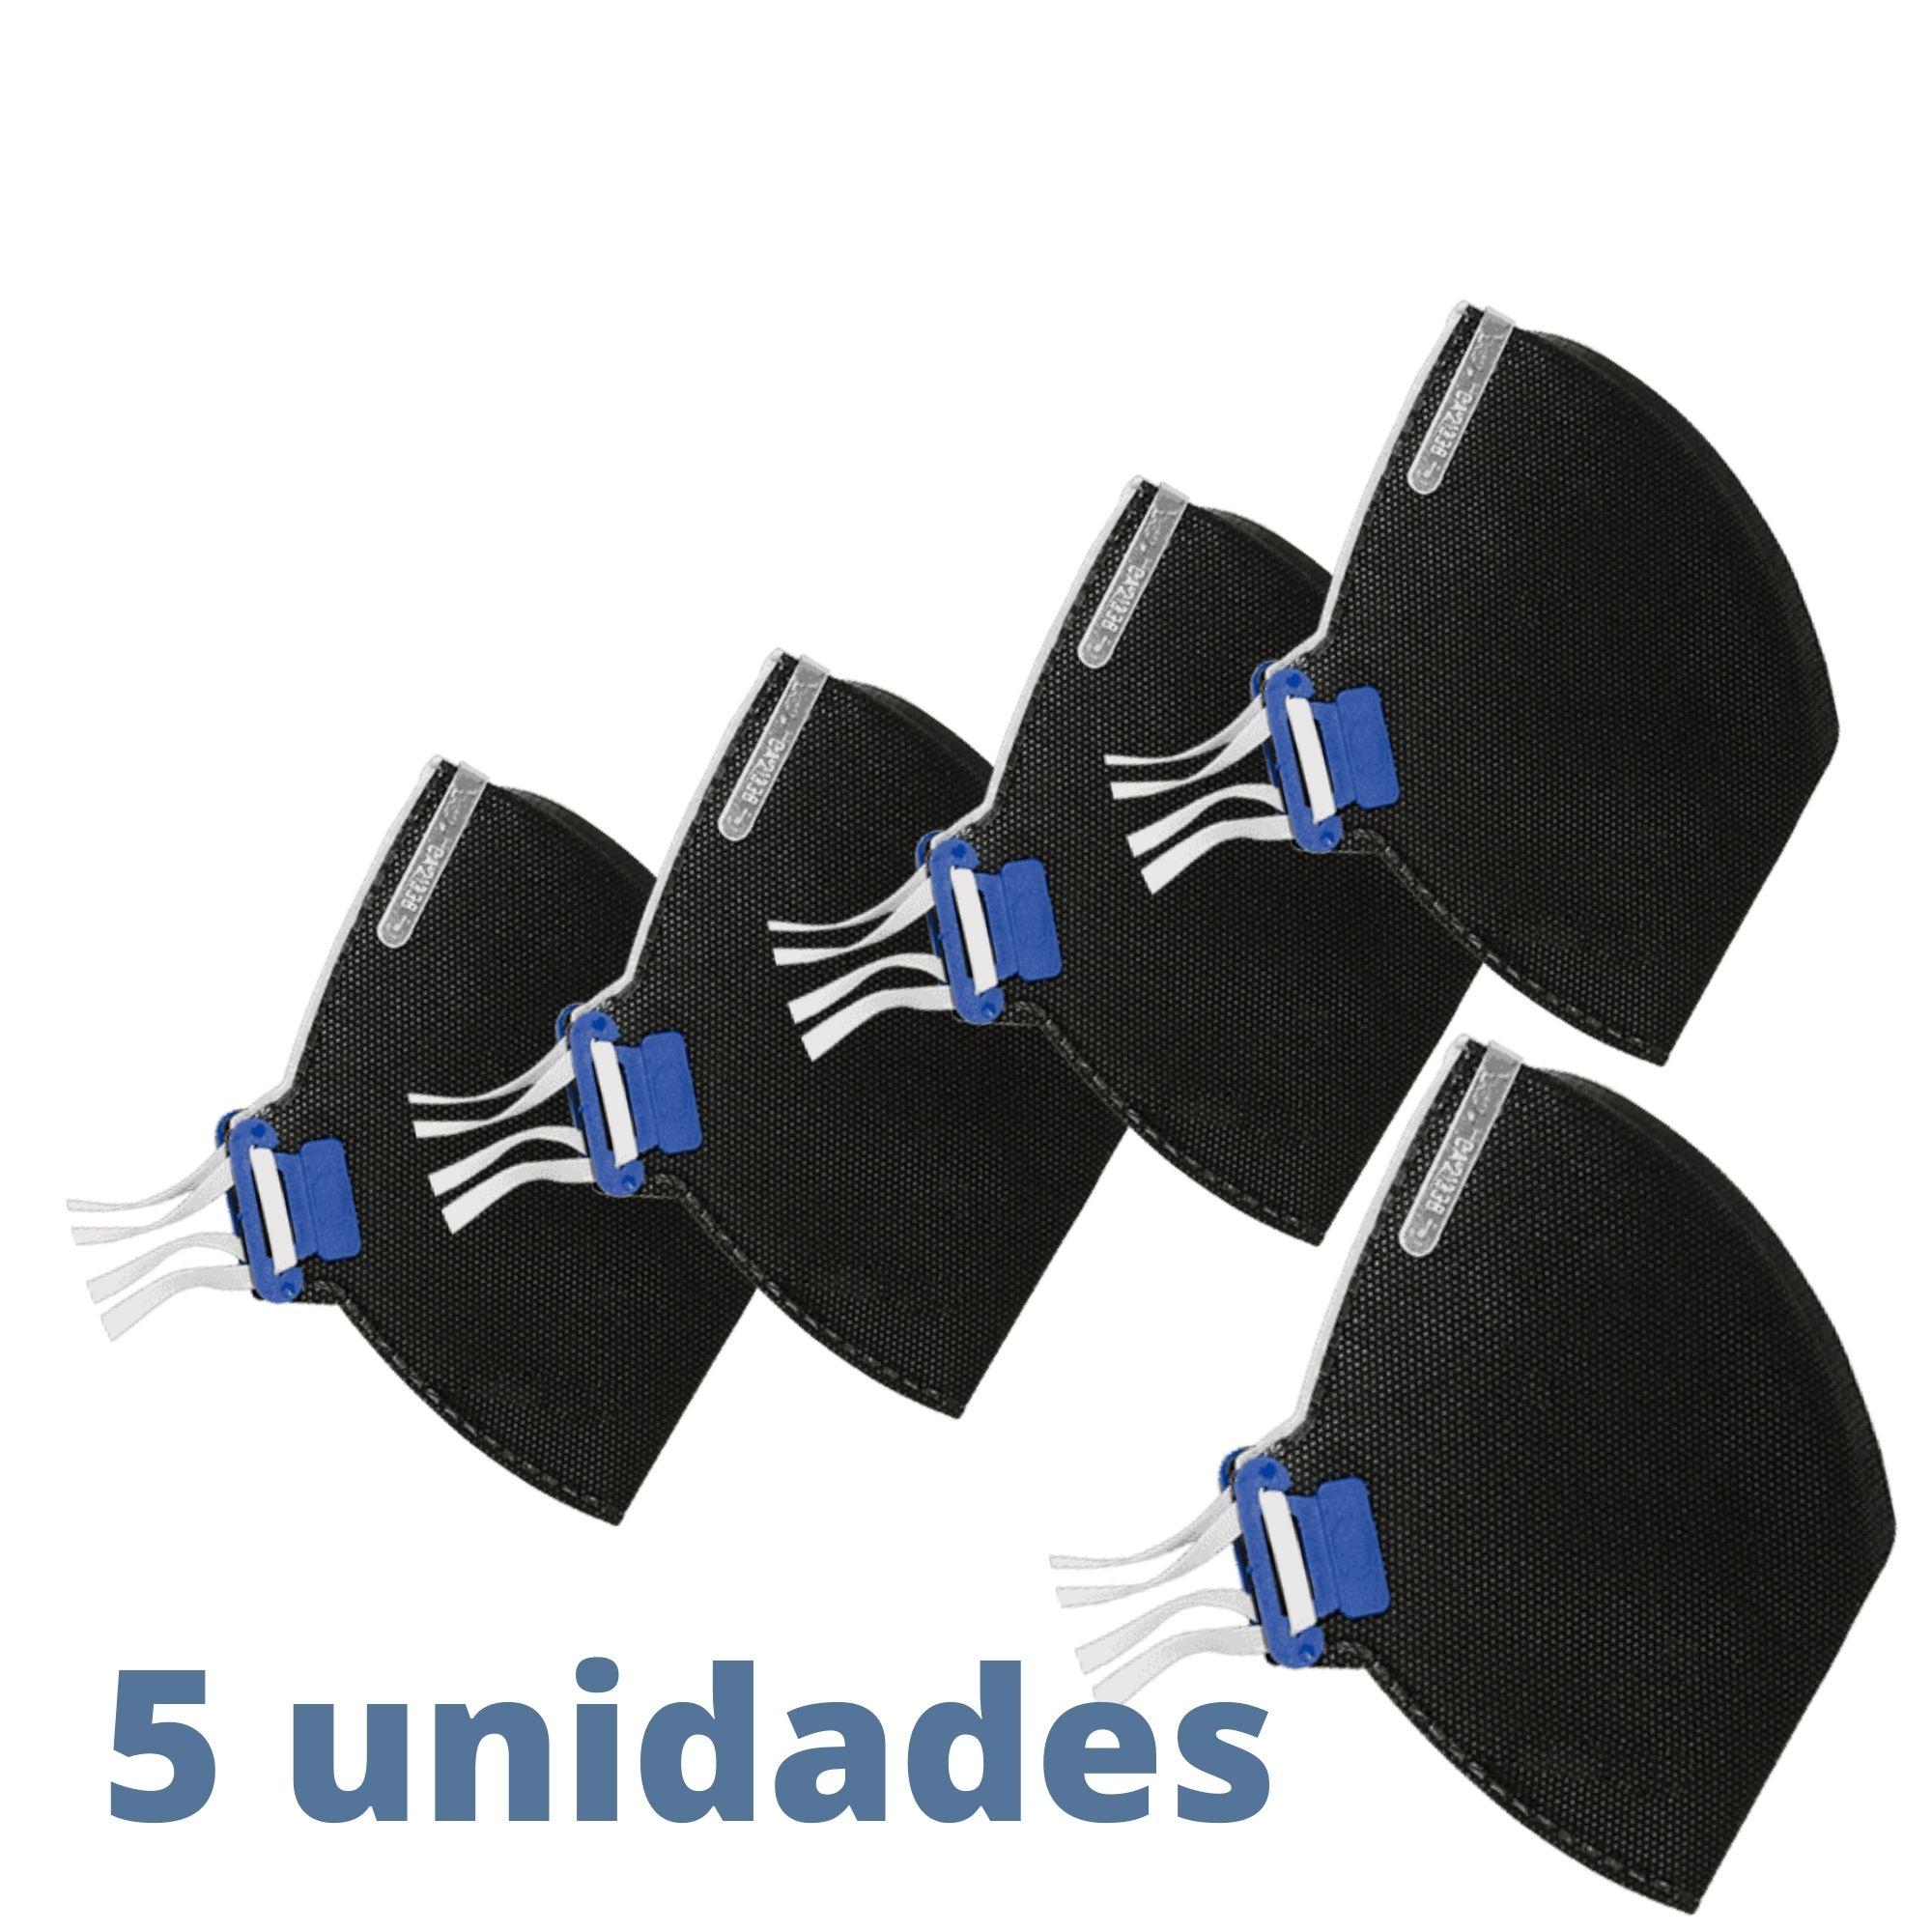 KIT DE 5 UNID - MÁSCARA DESCARTÁVEL PFF2-S SEM VALVULA  - CARVÃO ATIVADO PRETA - TAYCO  - DE PAULA EPI